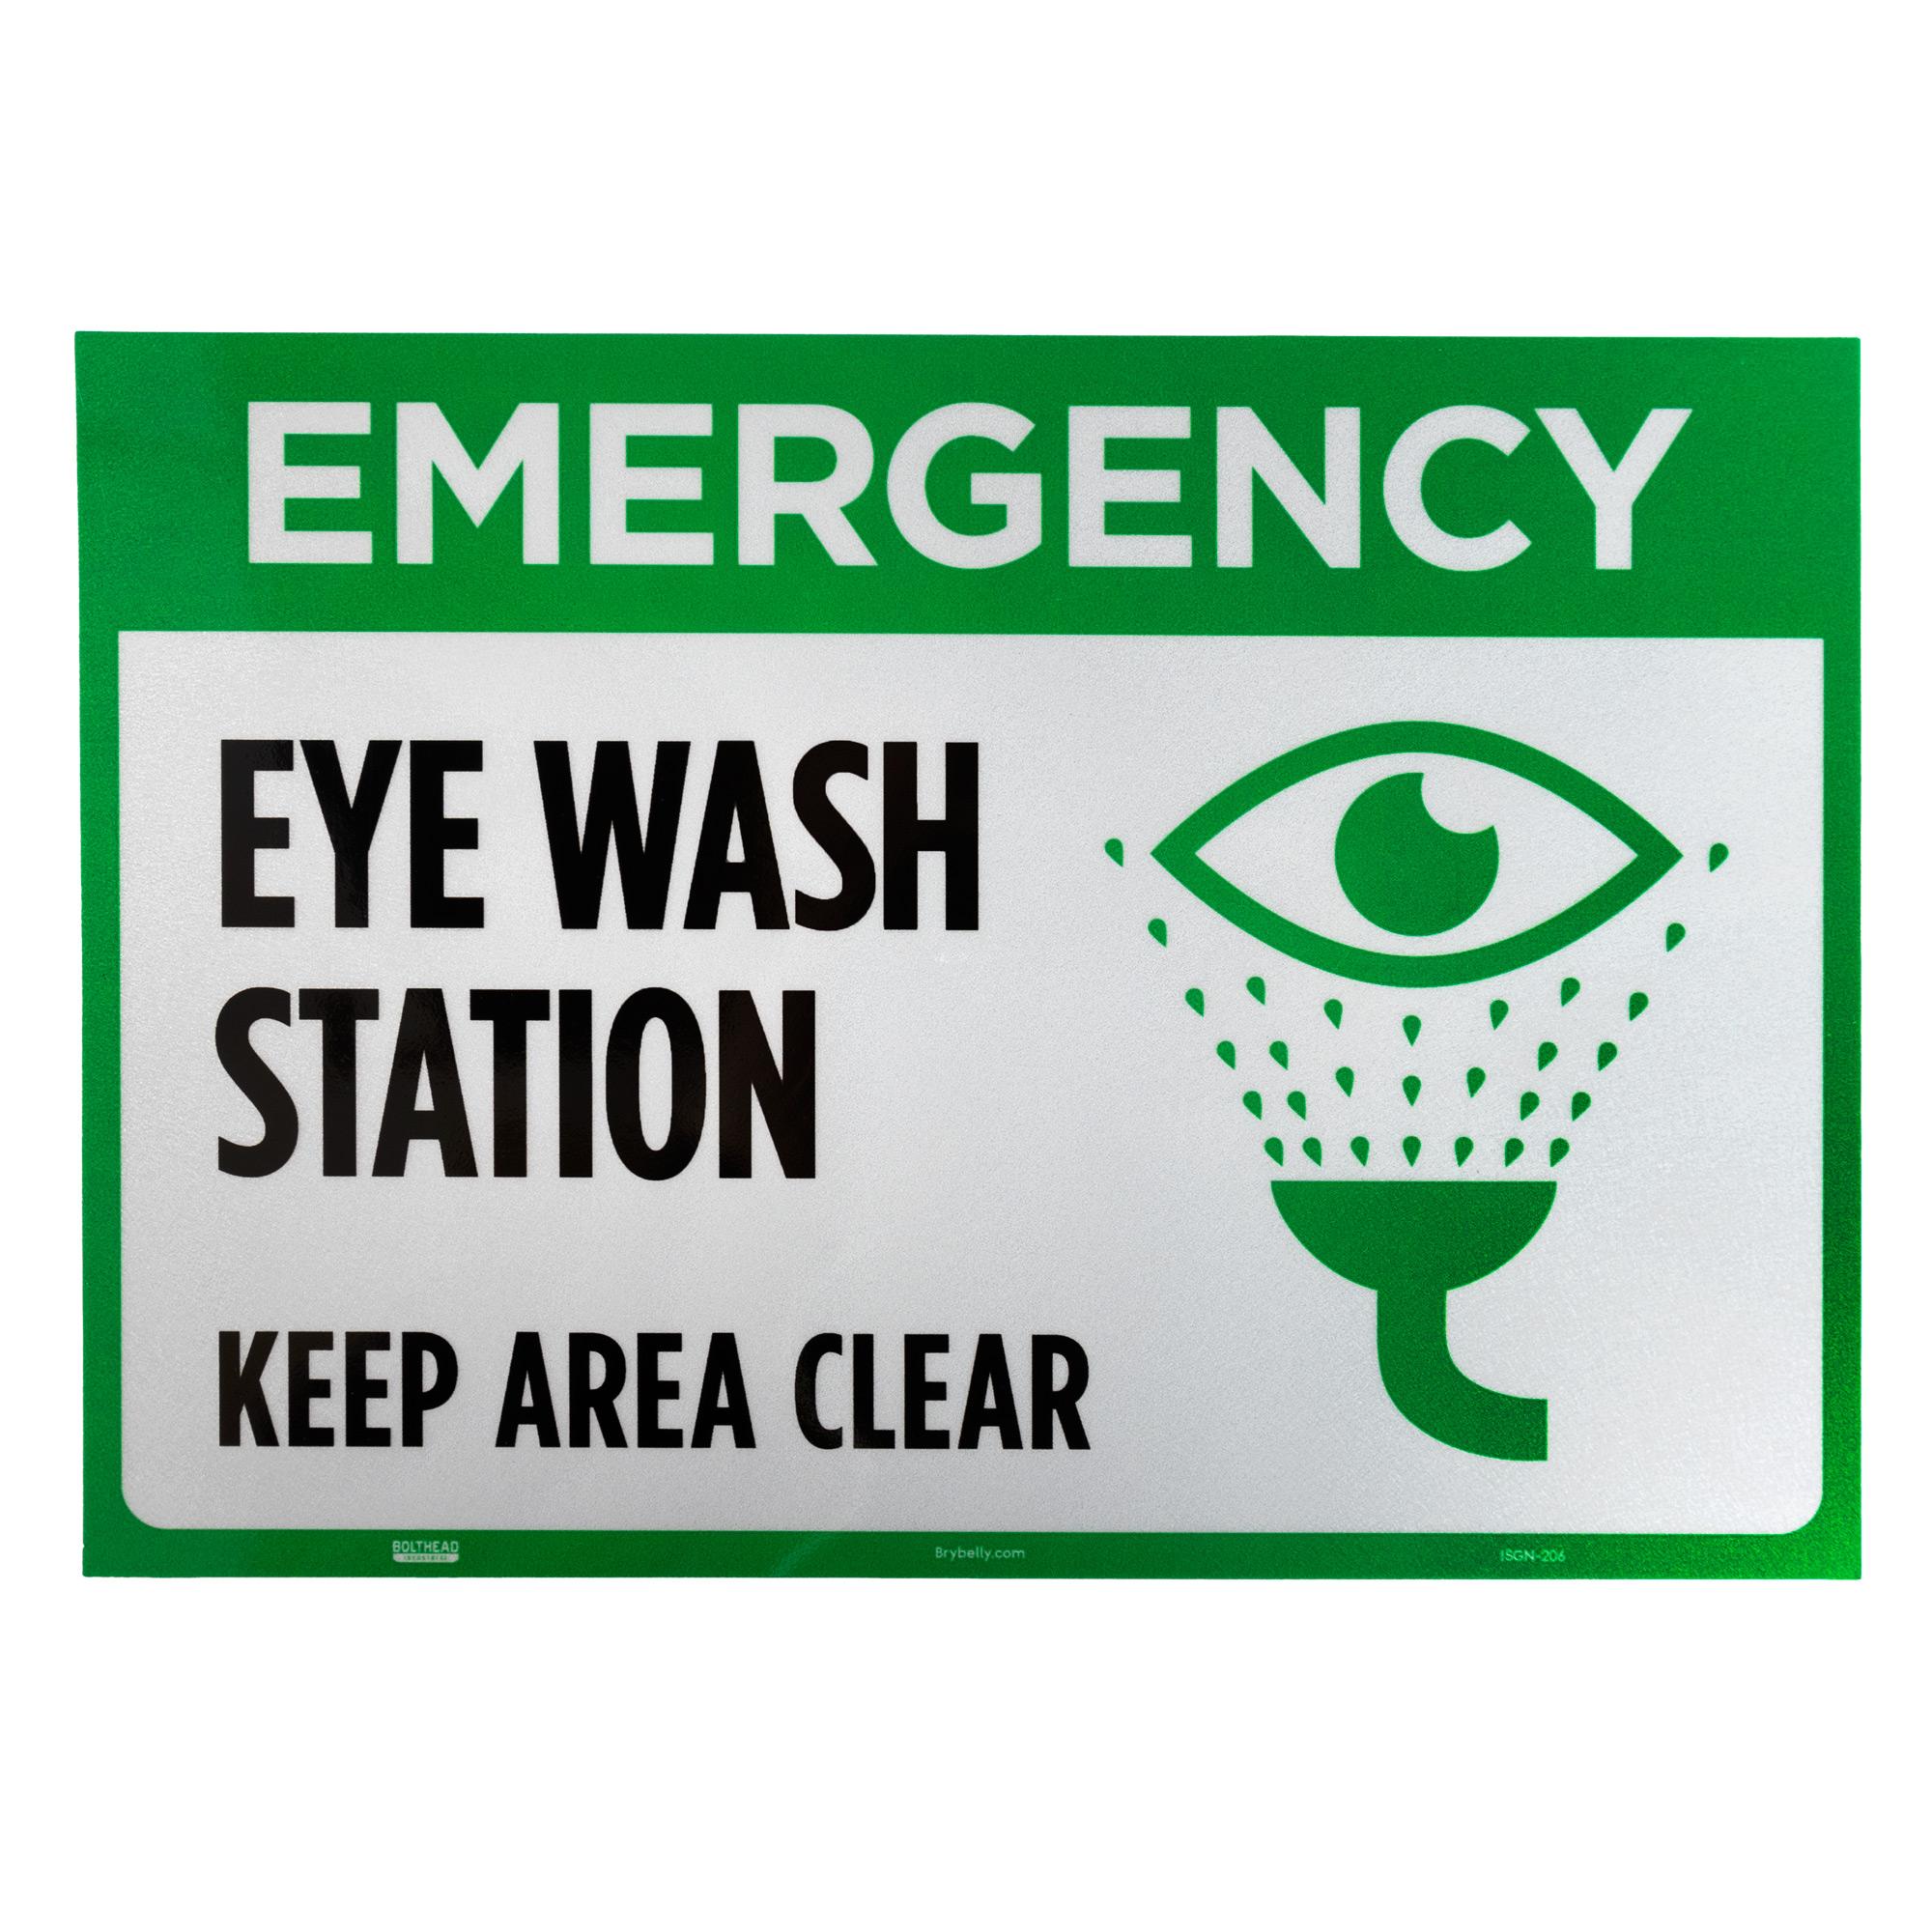 Emergency Eye Wash Station Self-Adhesive Decal